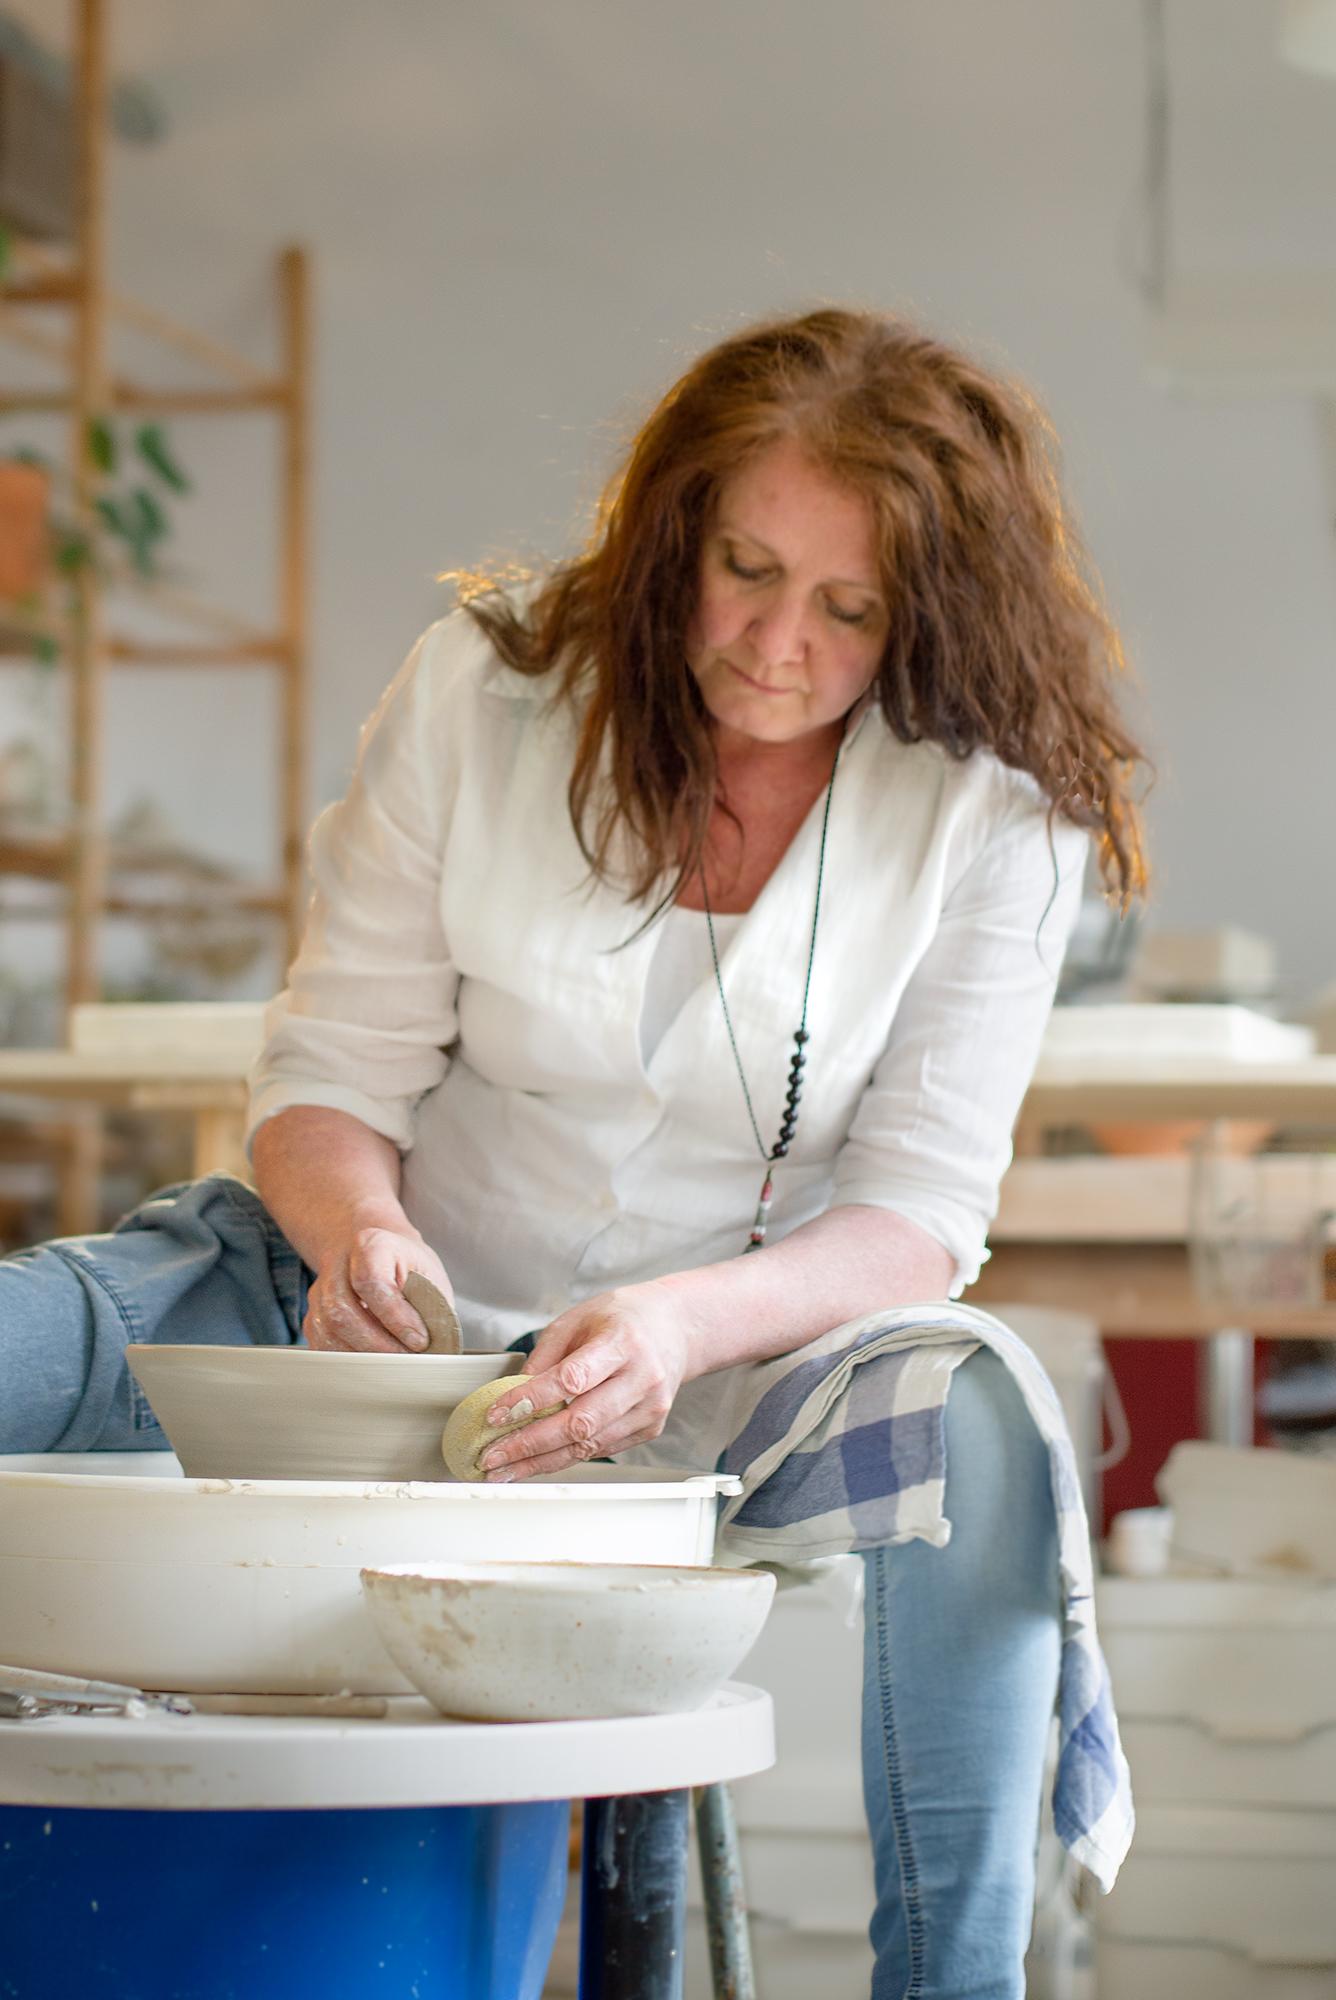 Madeleine fo Gallery Nordeinde throwing pots in her atelier.